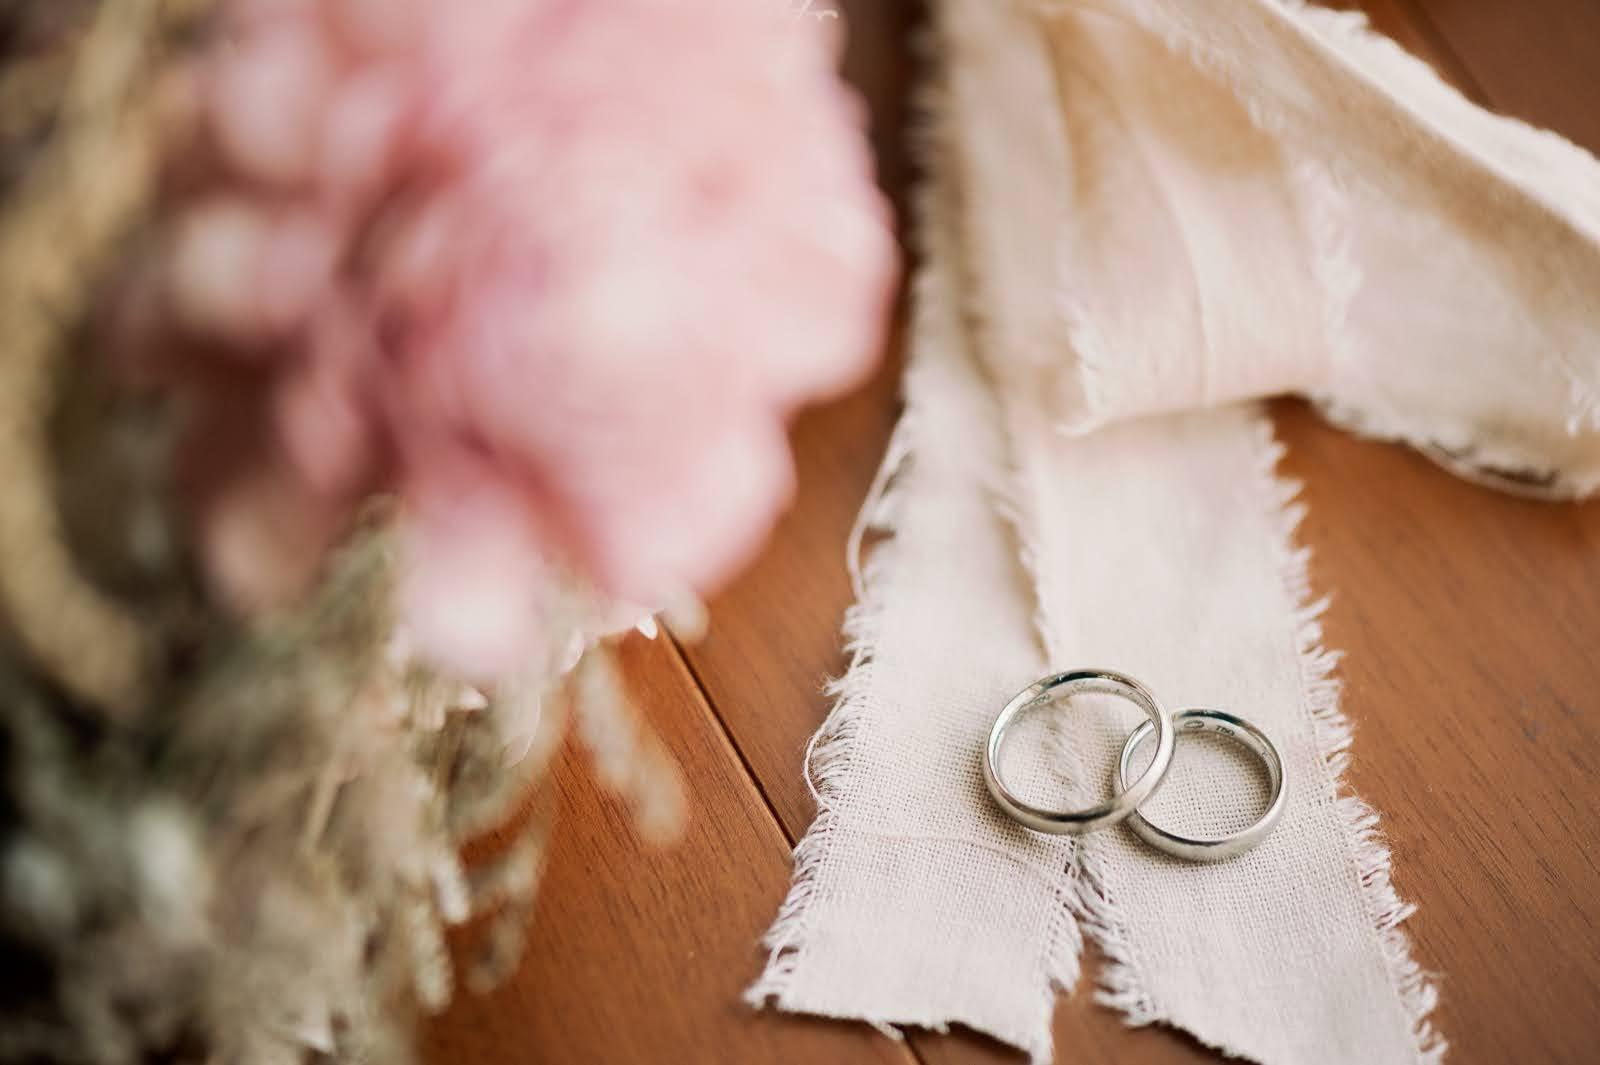 getmarry, 高雄婚攝, 義大酒店, 優質婚攝, 派大楊, 婚禮記錄, 婚禮攝影, 婚禮紀實, 婚宴, PTT, 婚攝收費, Wedding, 全天婚禮, edaroyal, 婚攝推薦, 美式婚禮,